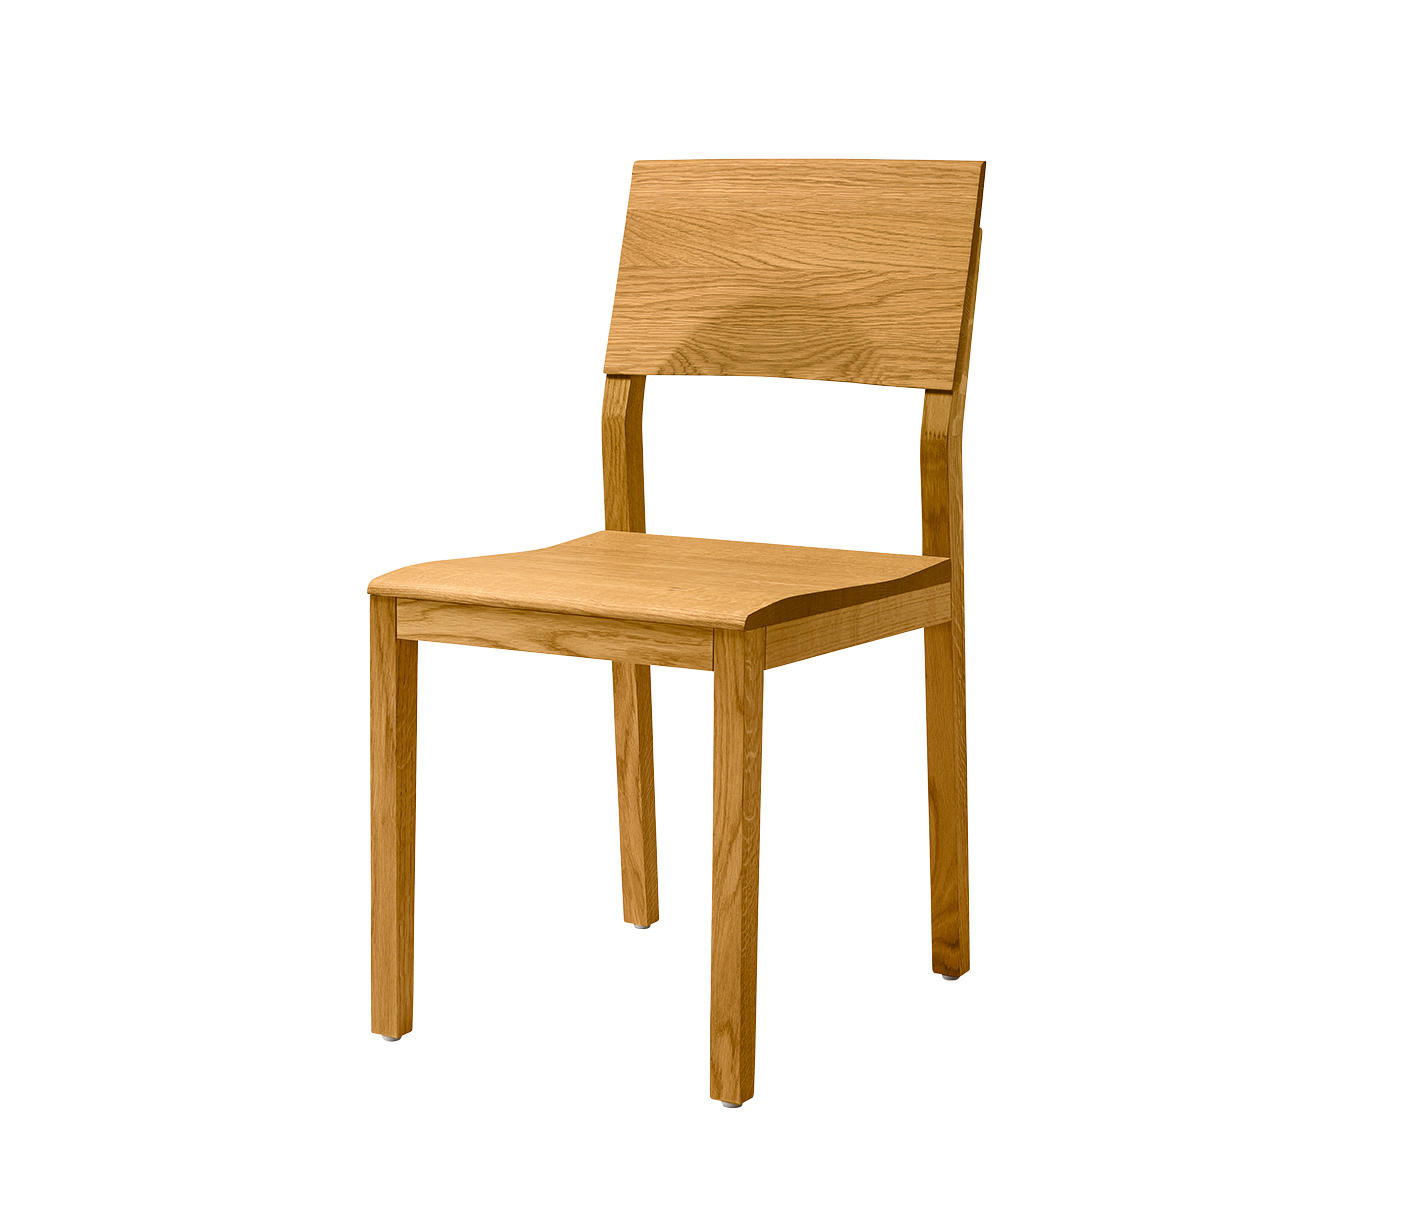 S1 Stuhl Stuhle Von Team 7 Architonic